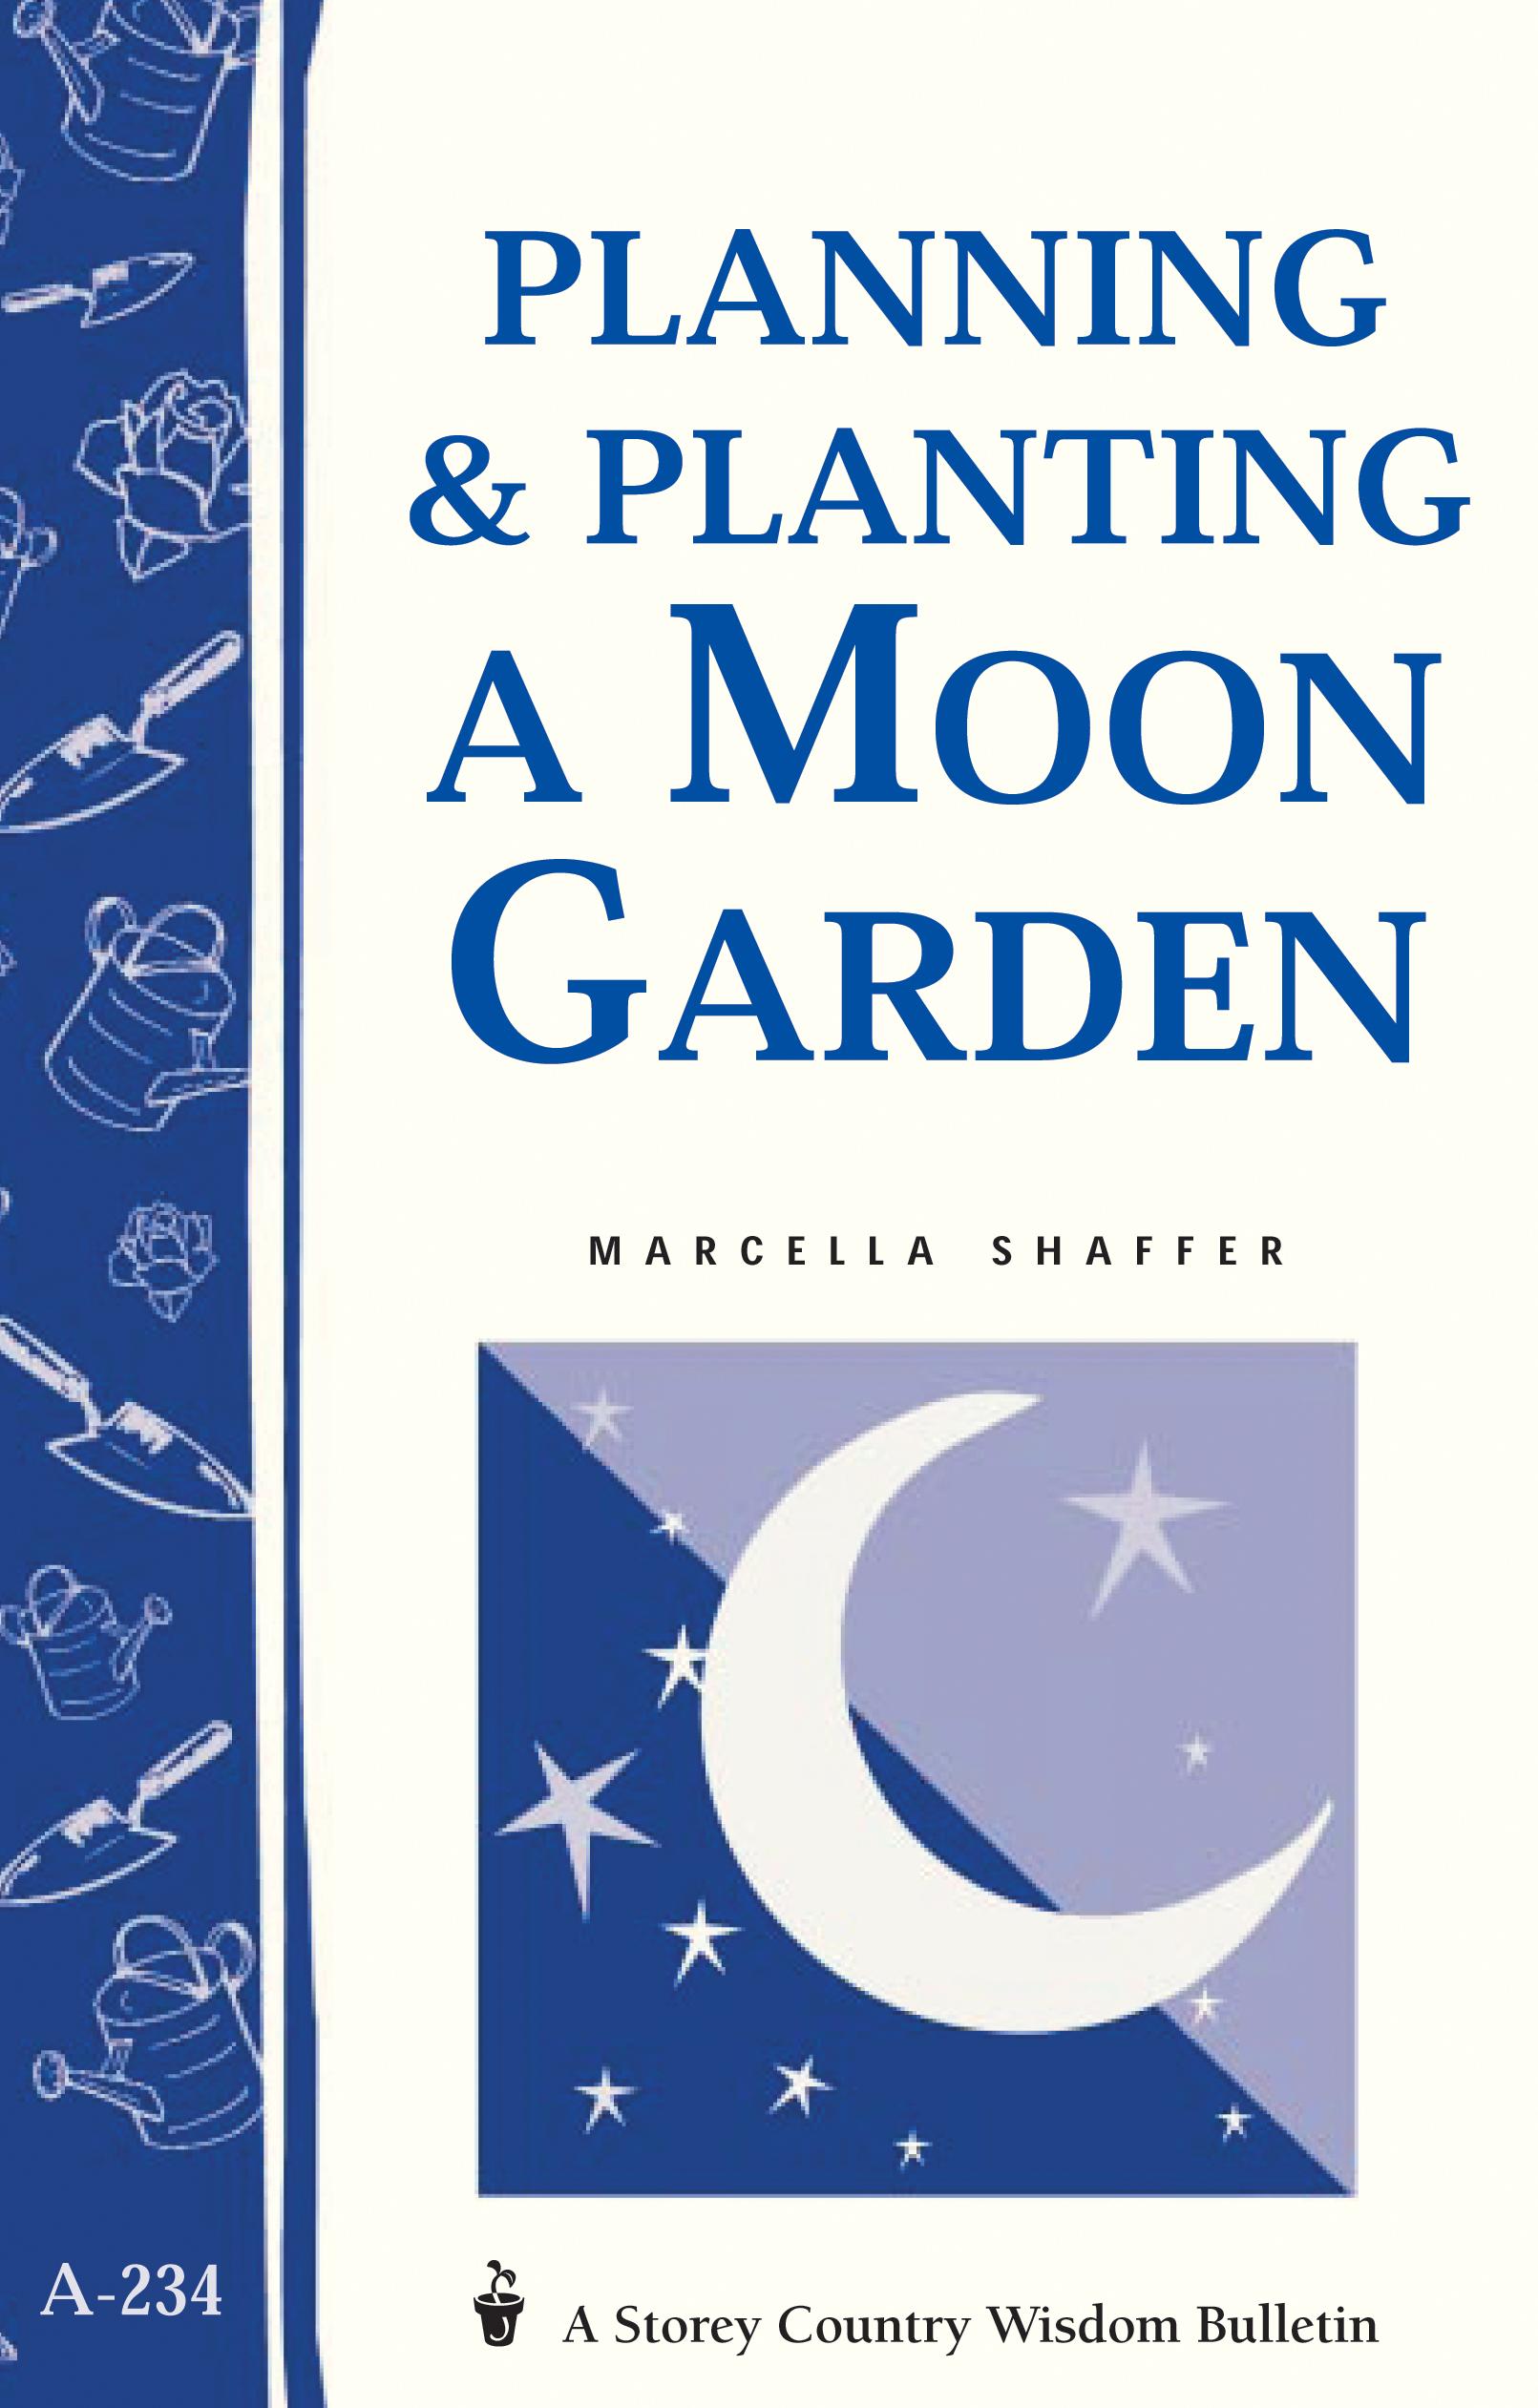 Planning & Planting a Moon Garden Storey's Country Wisdom Bulletin A-234 - Marcella Shaffer